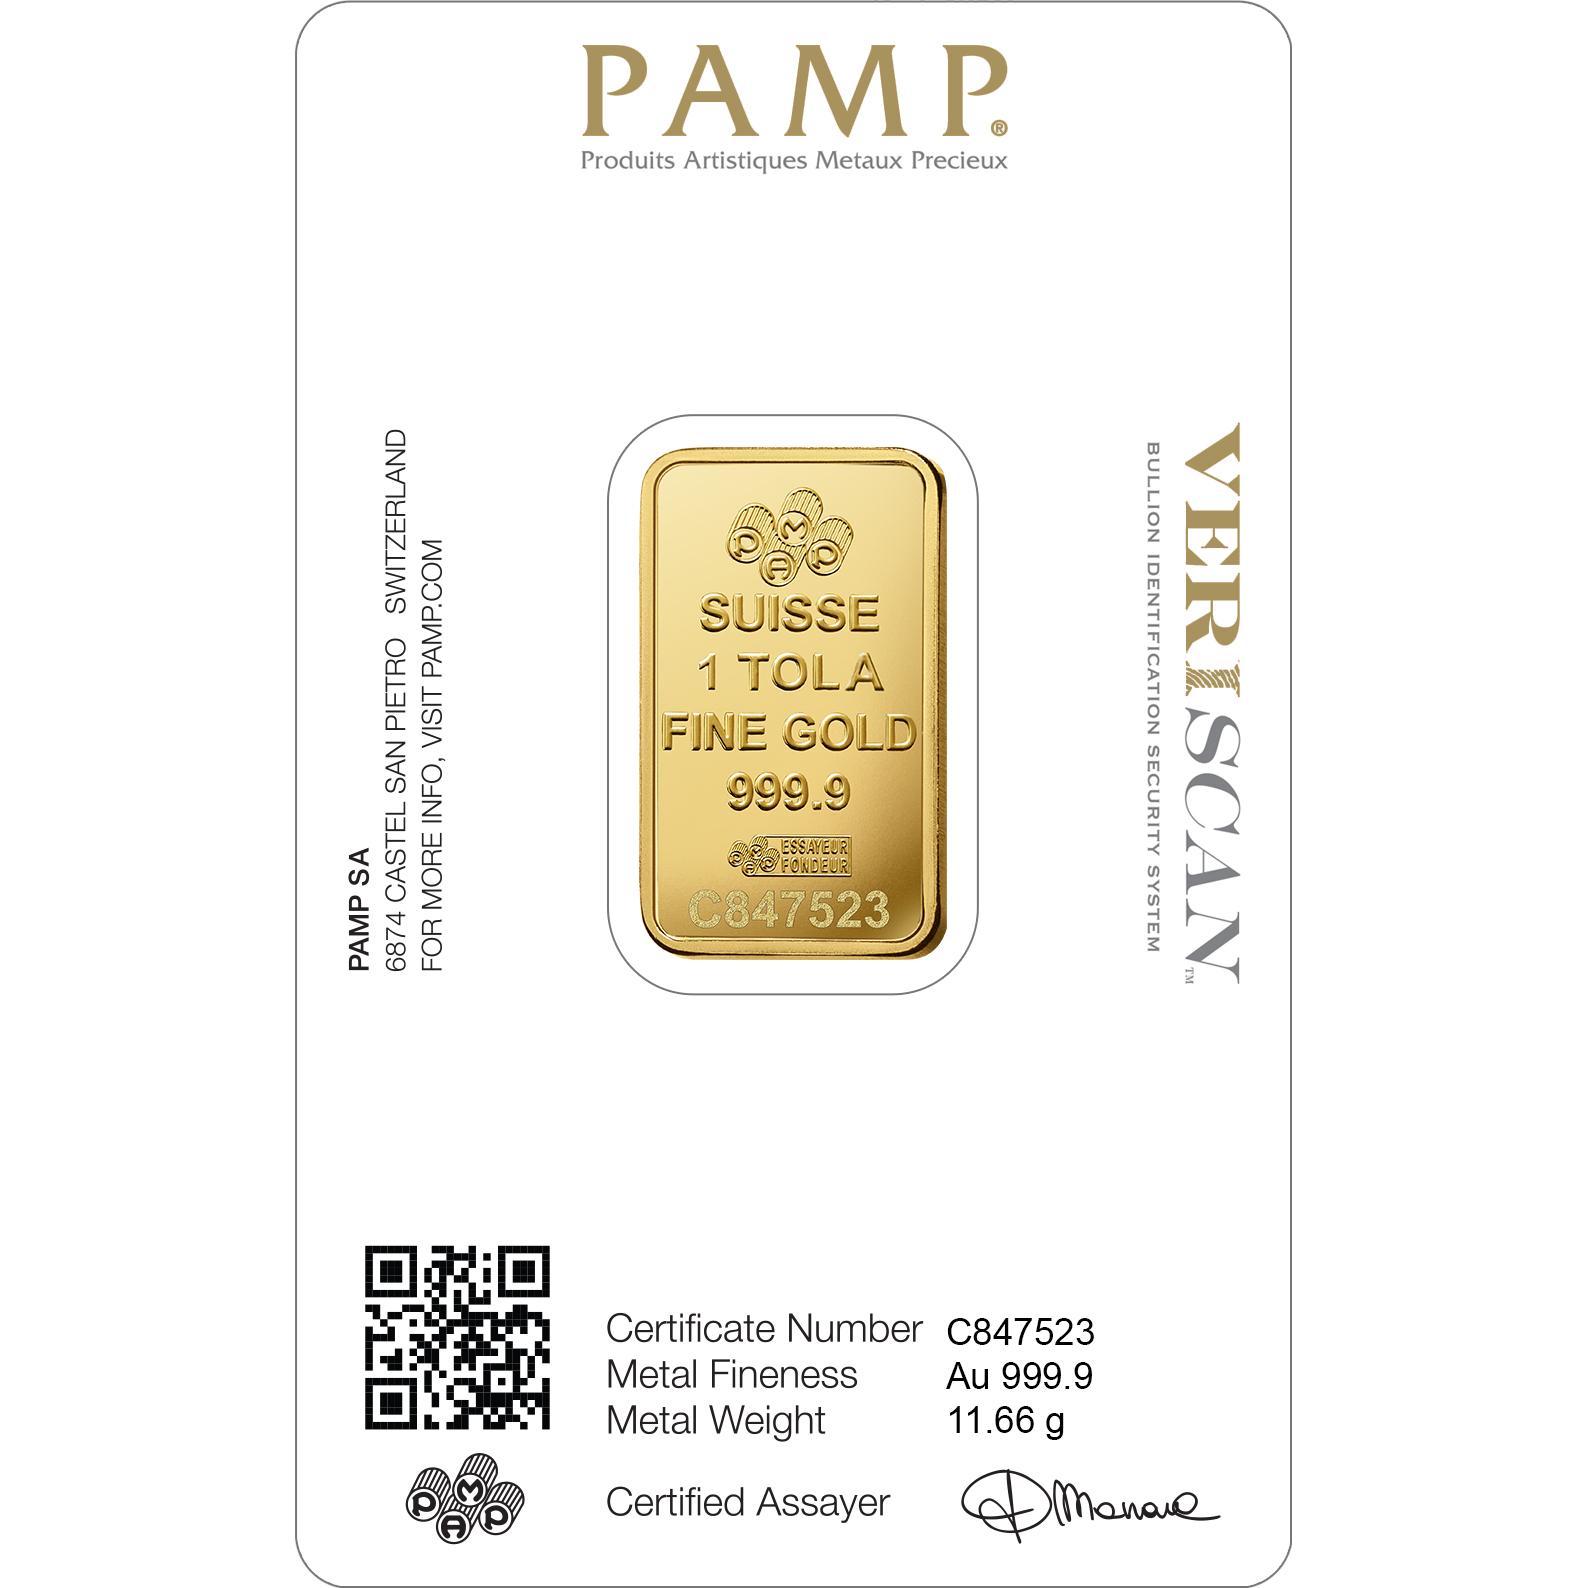 1 tola Gold Bar - PAMP Suisse Lady Fortuna Veriscan